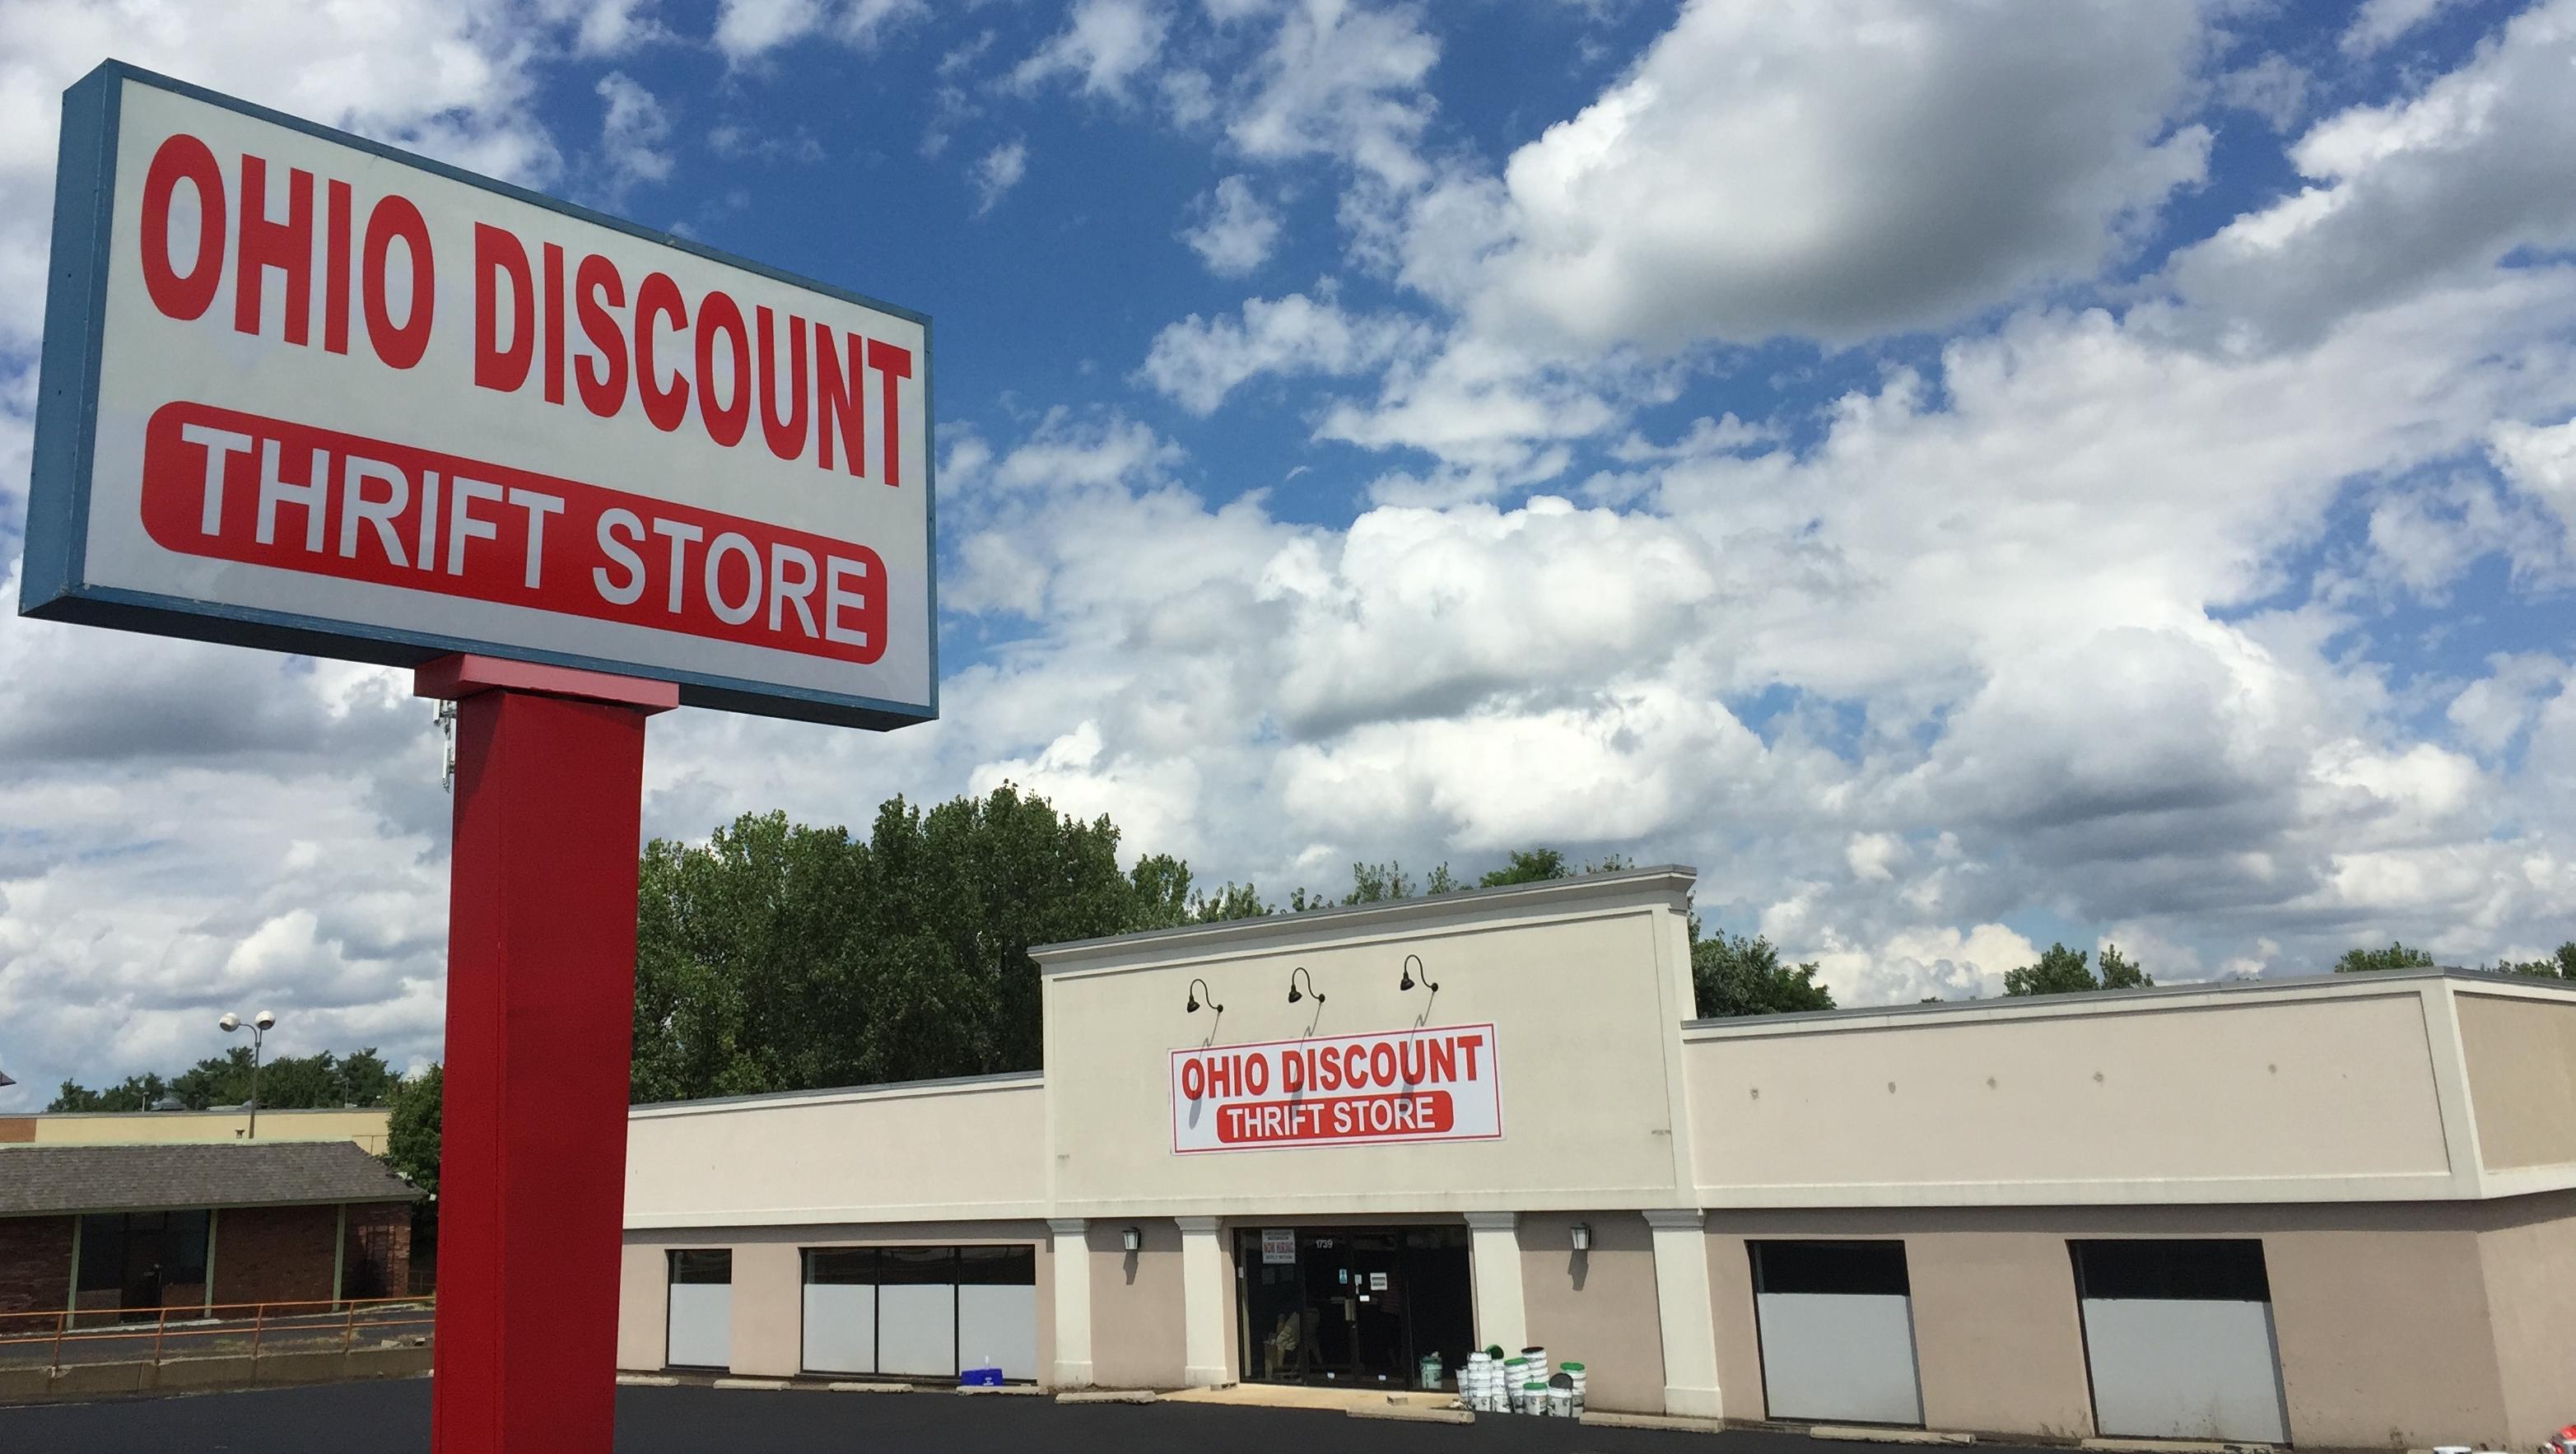 Ohio Discount Thrift Store Facade